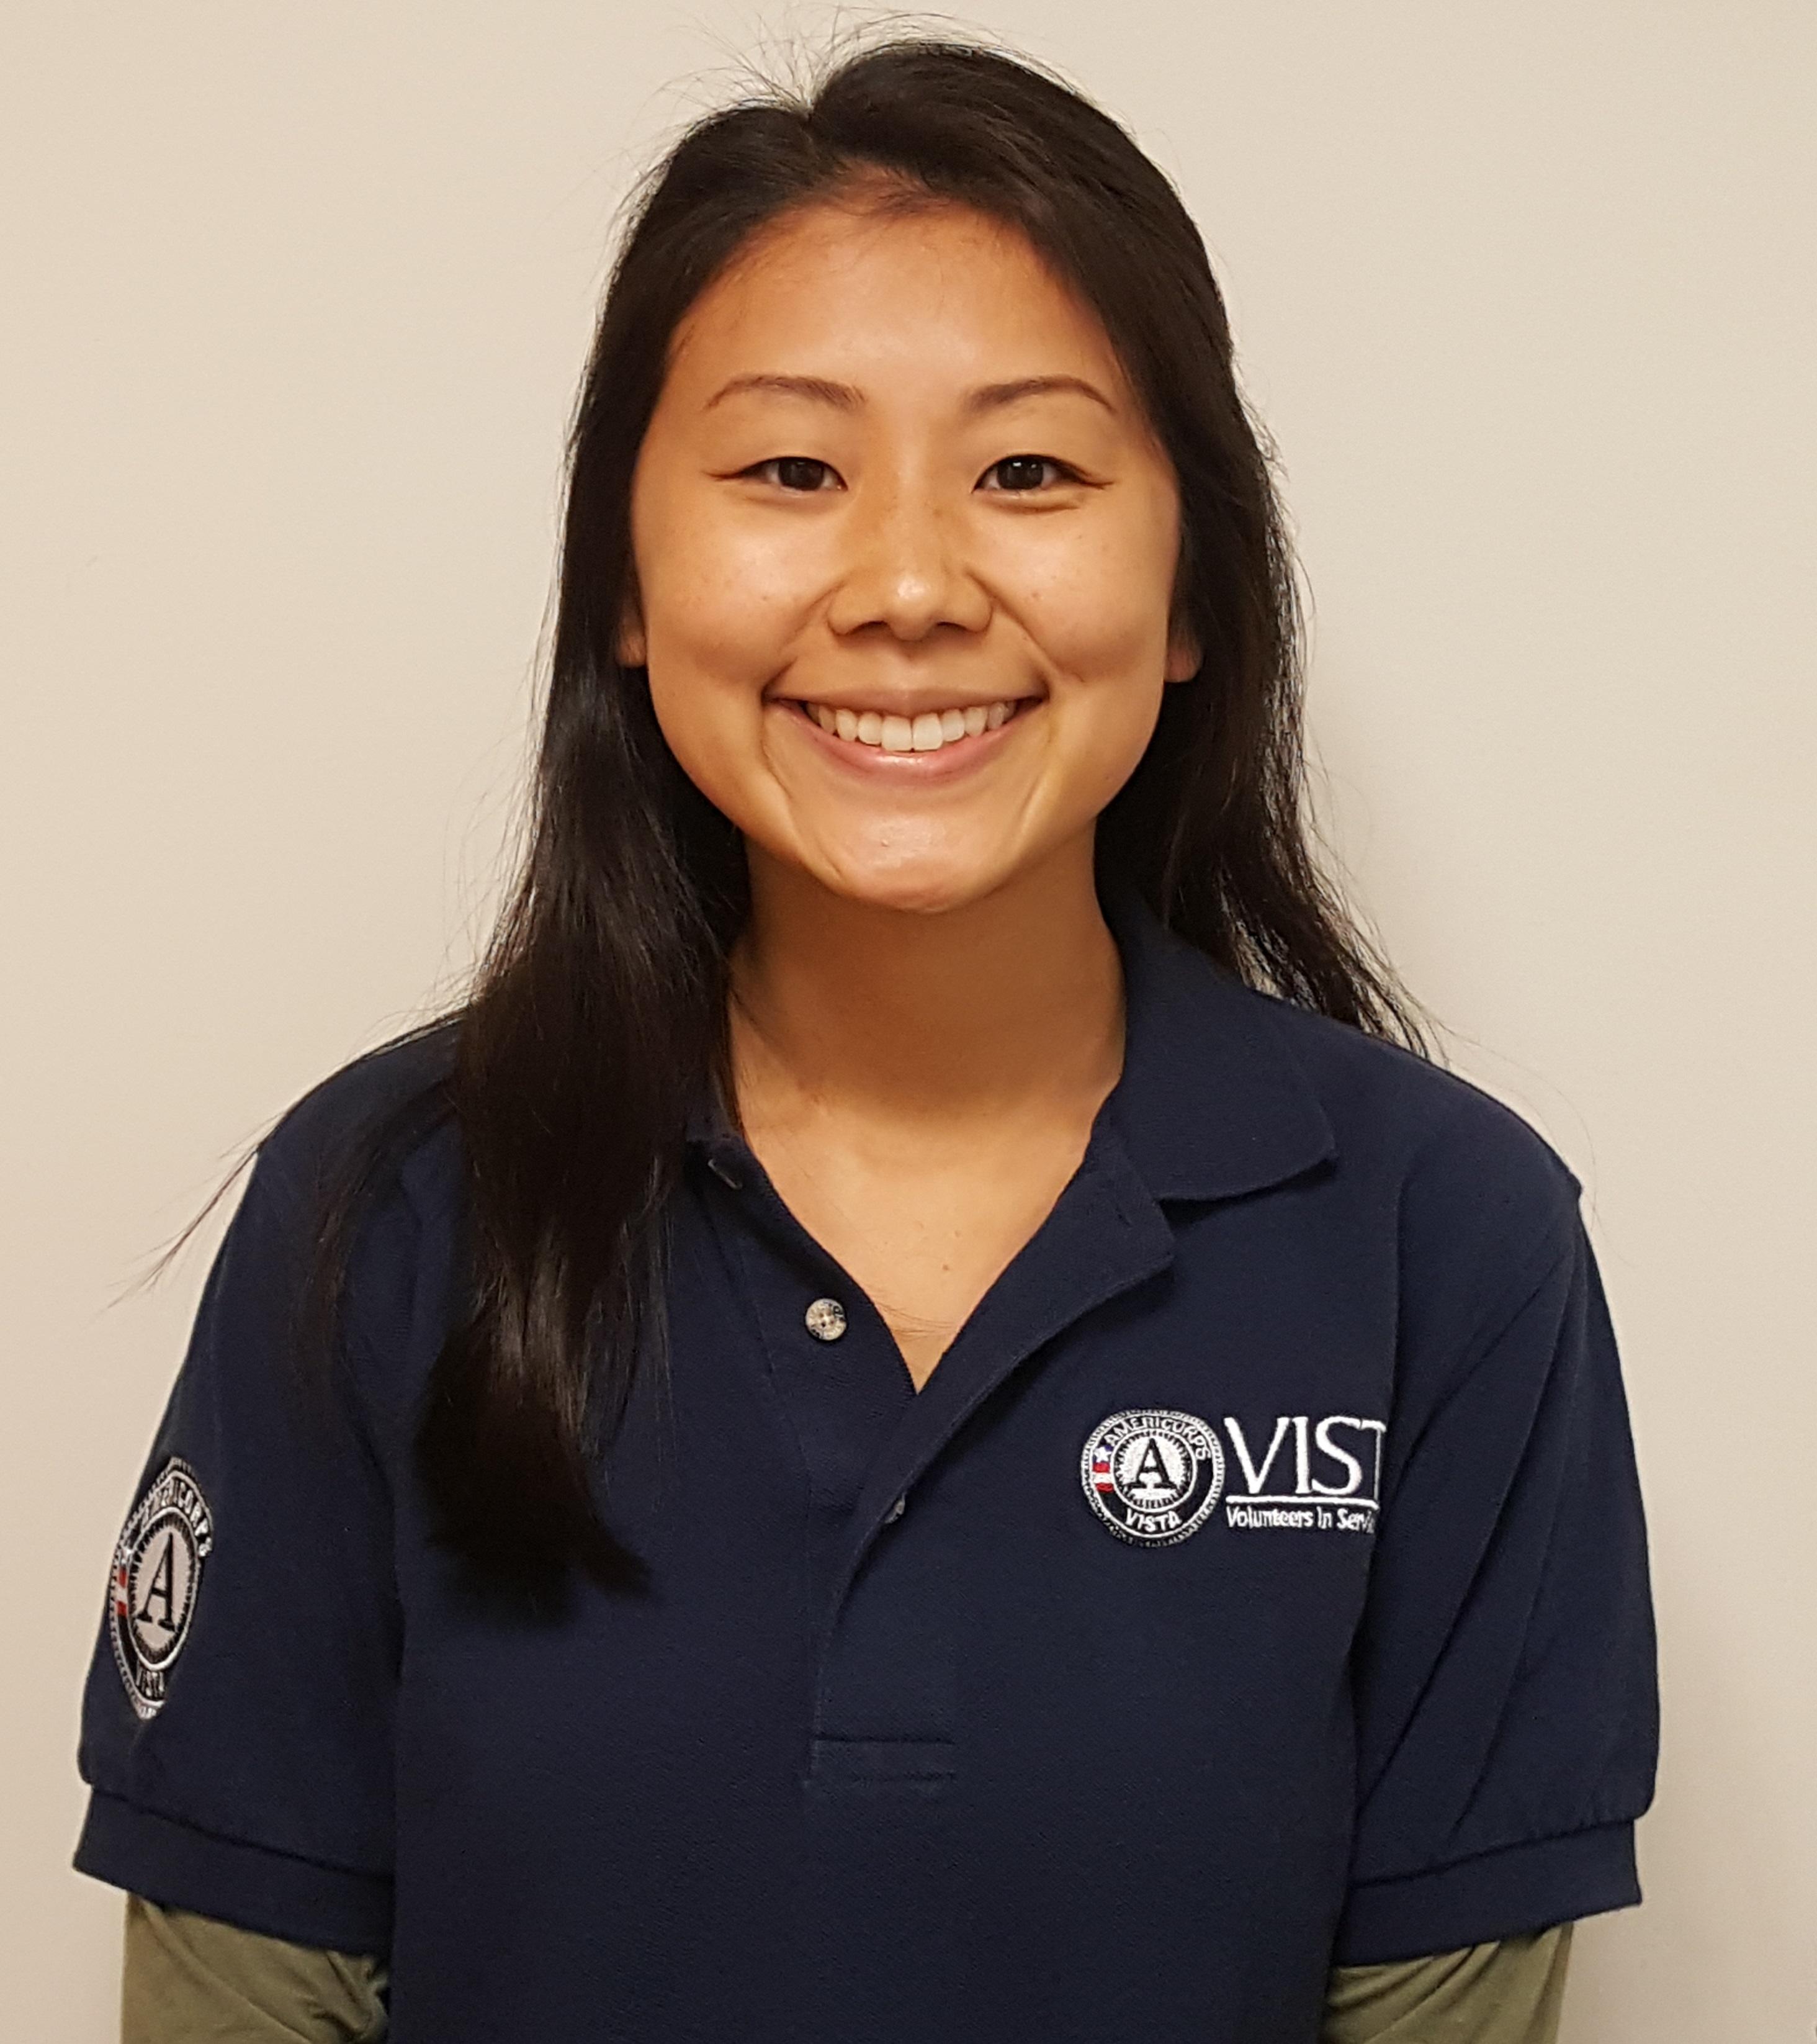 Bess Fleischman, AmeriCorps VISTA 2017-18 (JRMC)